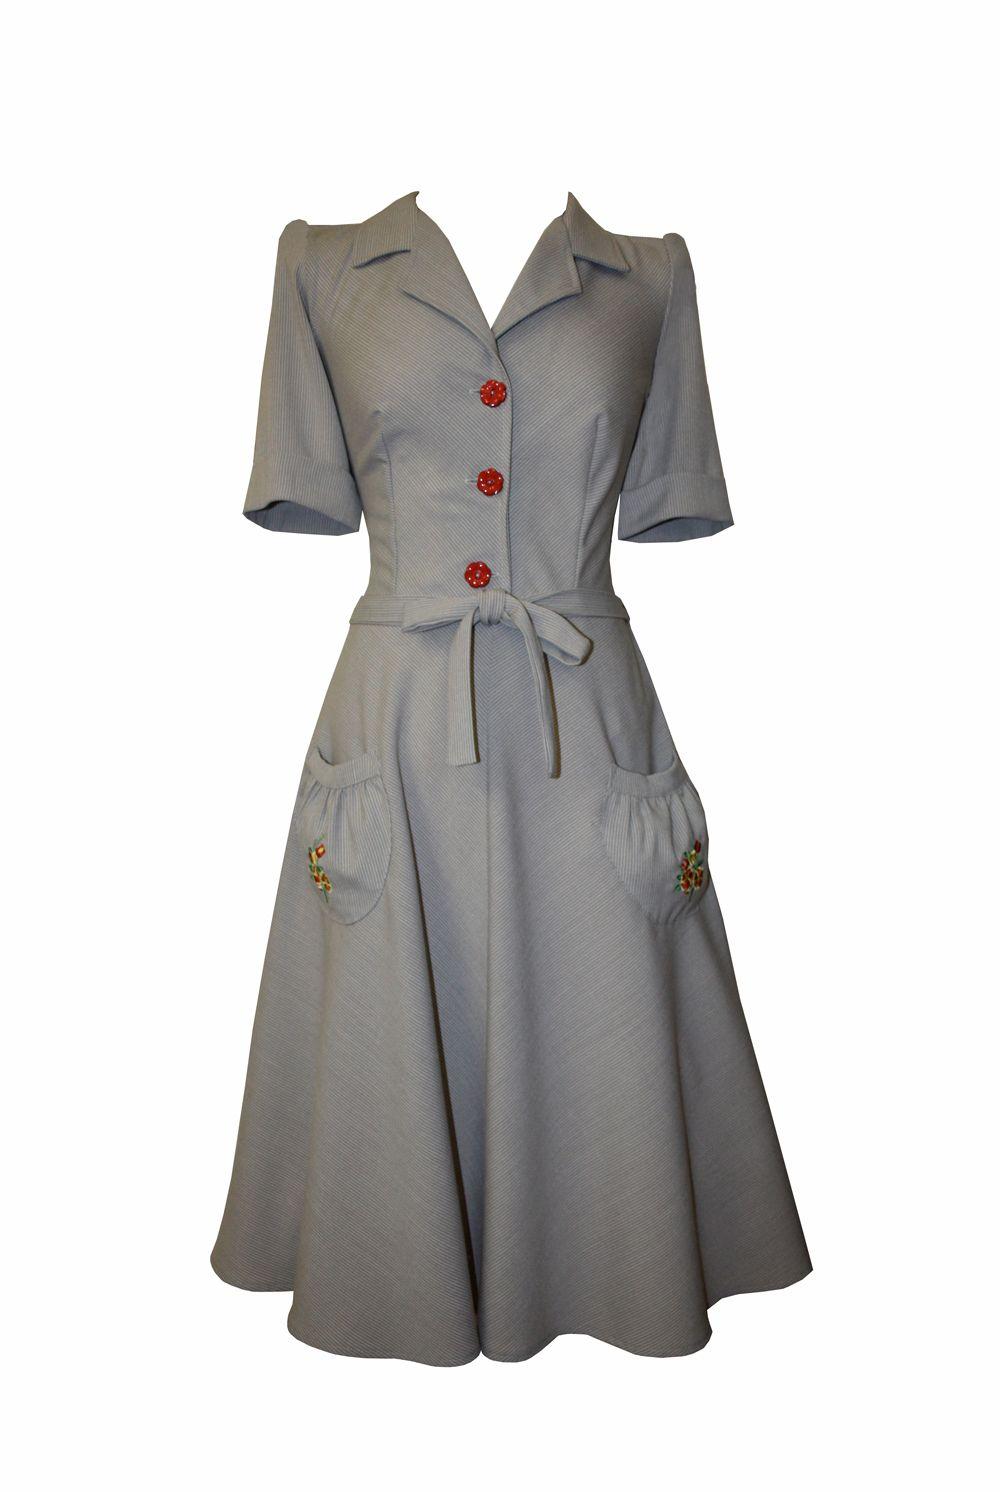 Tara Starlet 1940s 40s Style: Homefront Dancing Dress Embroidered Pocket